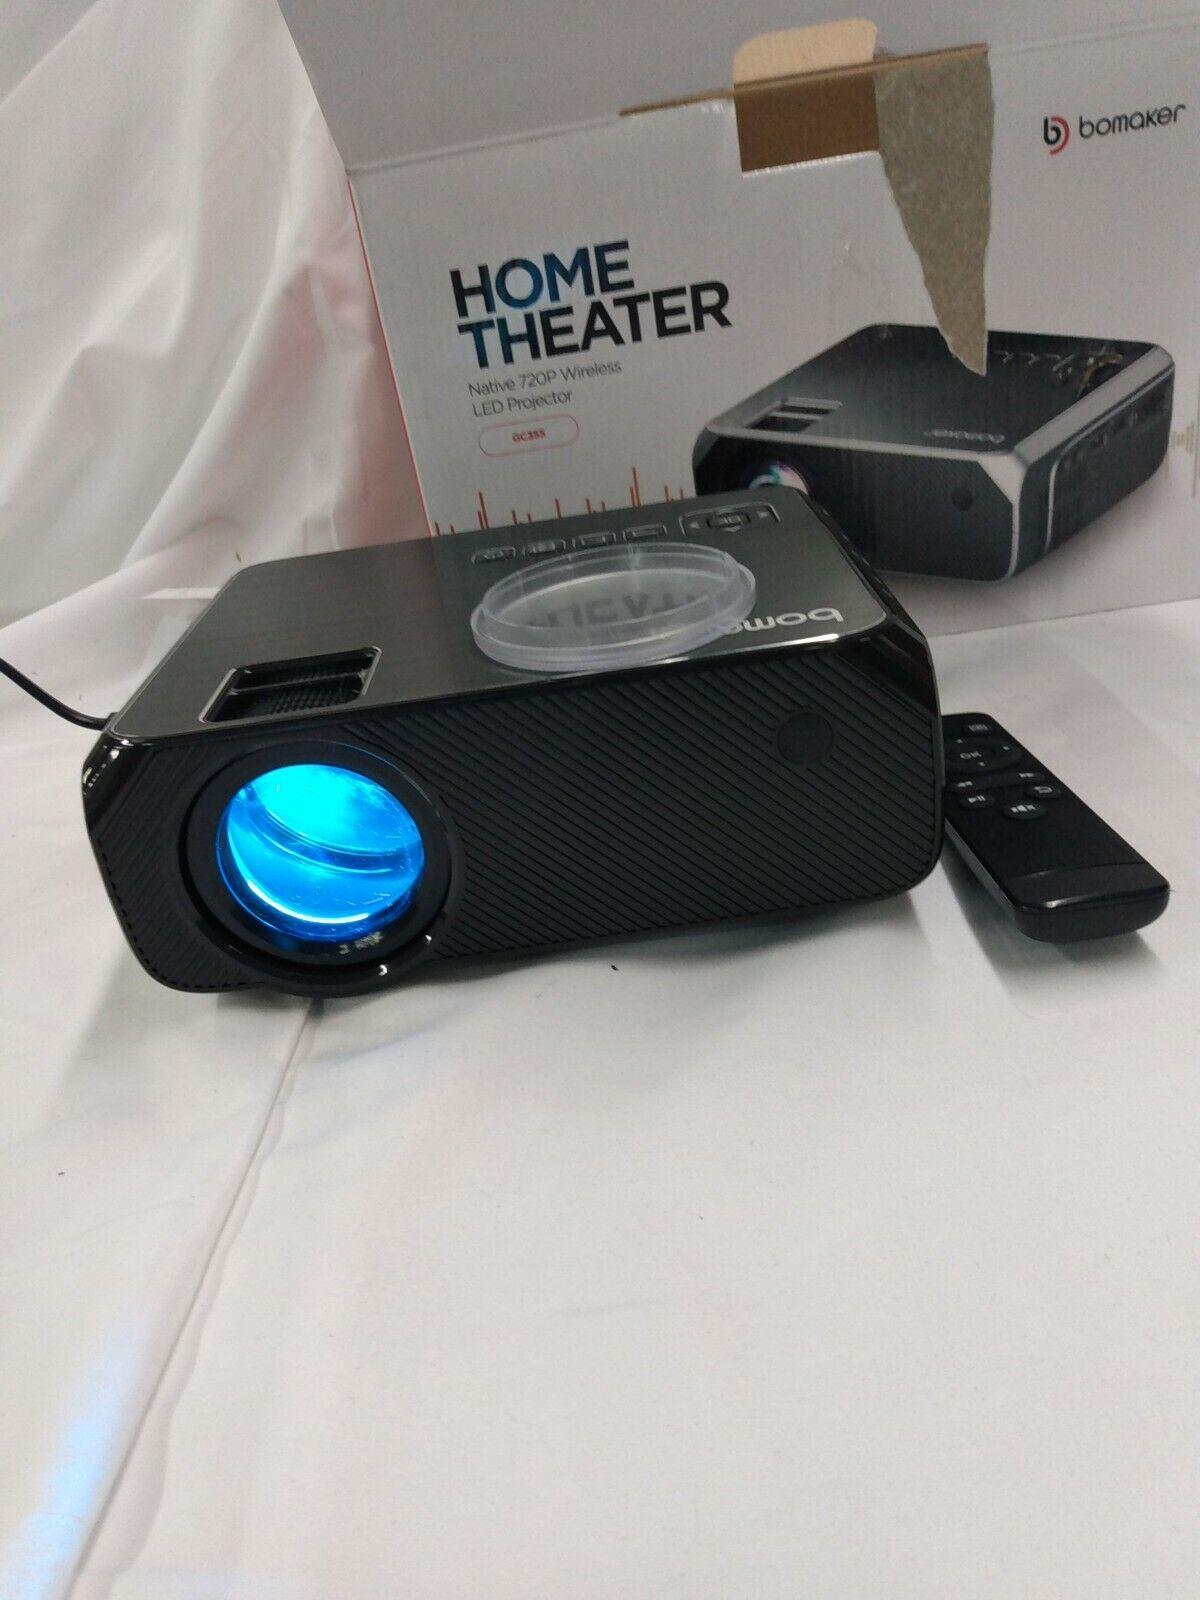 bargaintreellcfp LS-8 Bomaker GC355, Wi-Fi Mini Projector(Black) Used